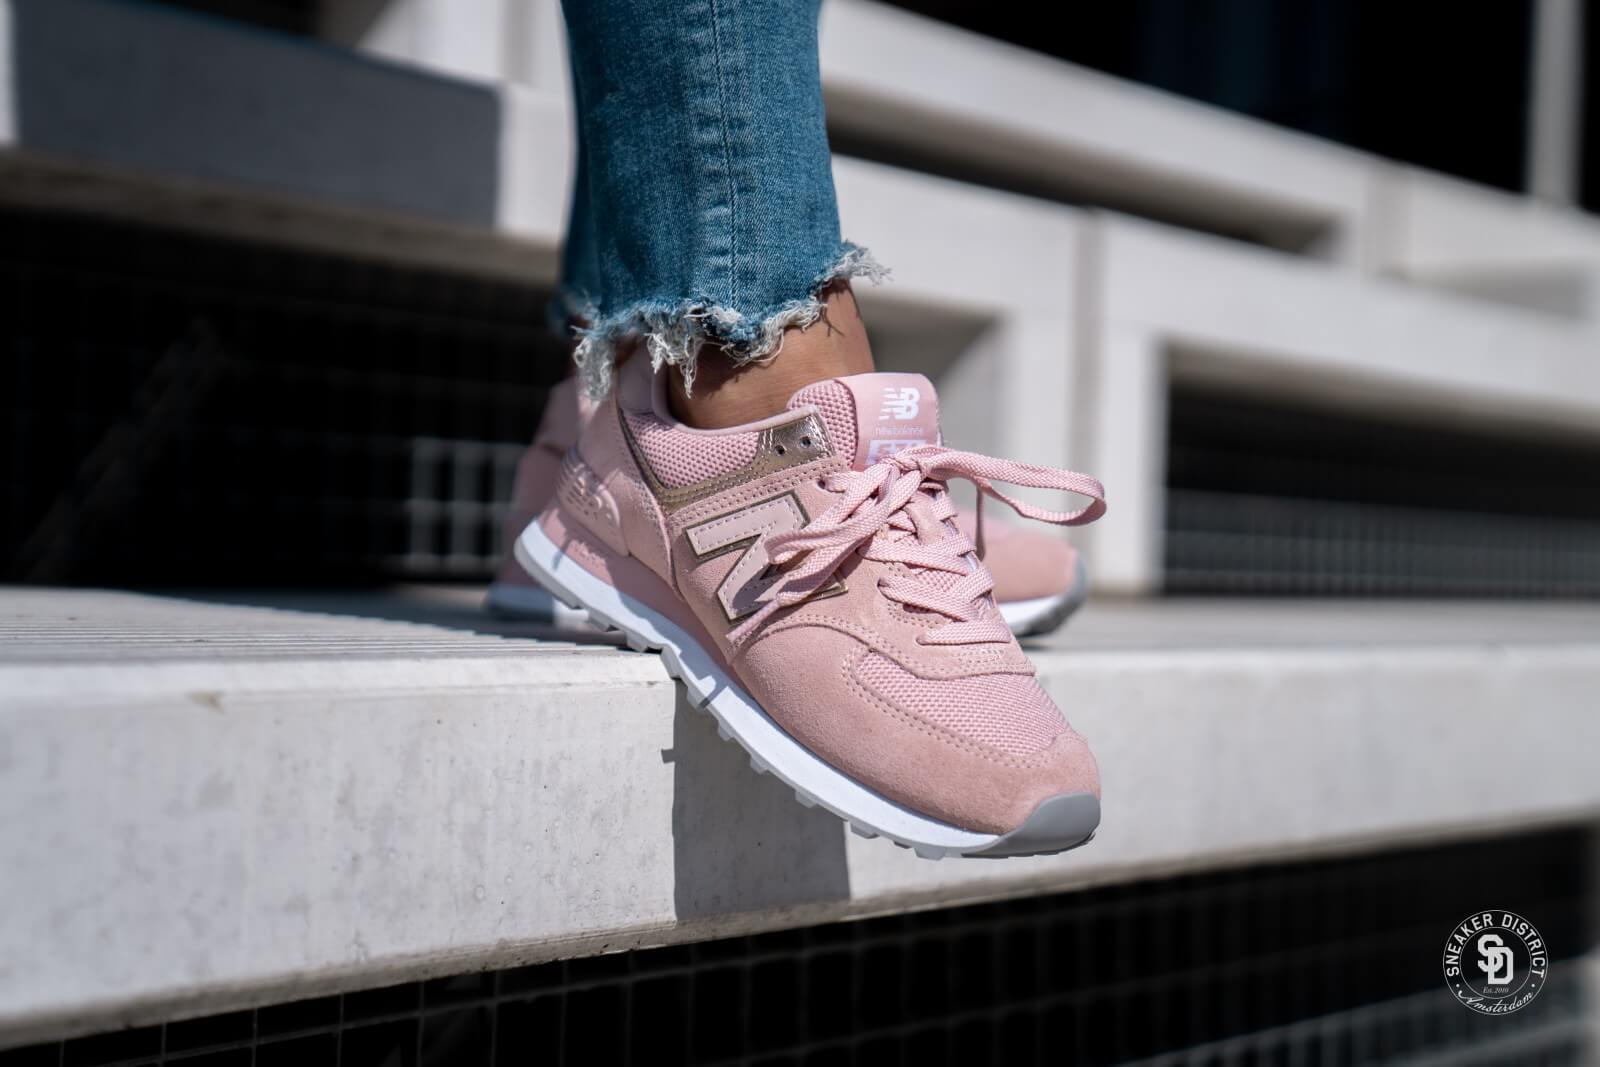 new balance 1600 womens Pink, OFF 73%,Buy!